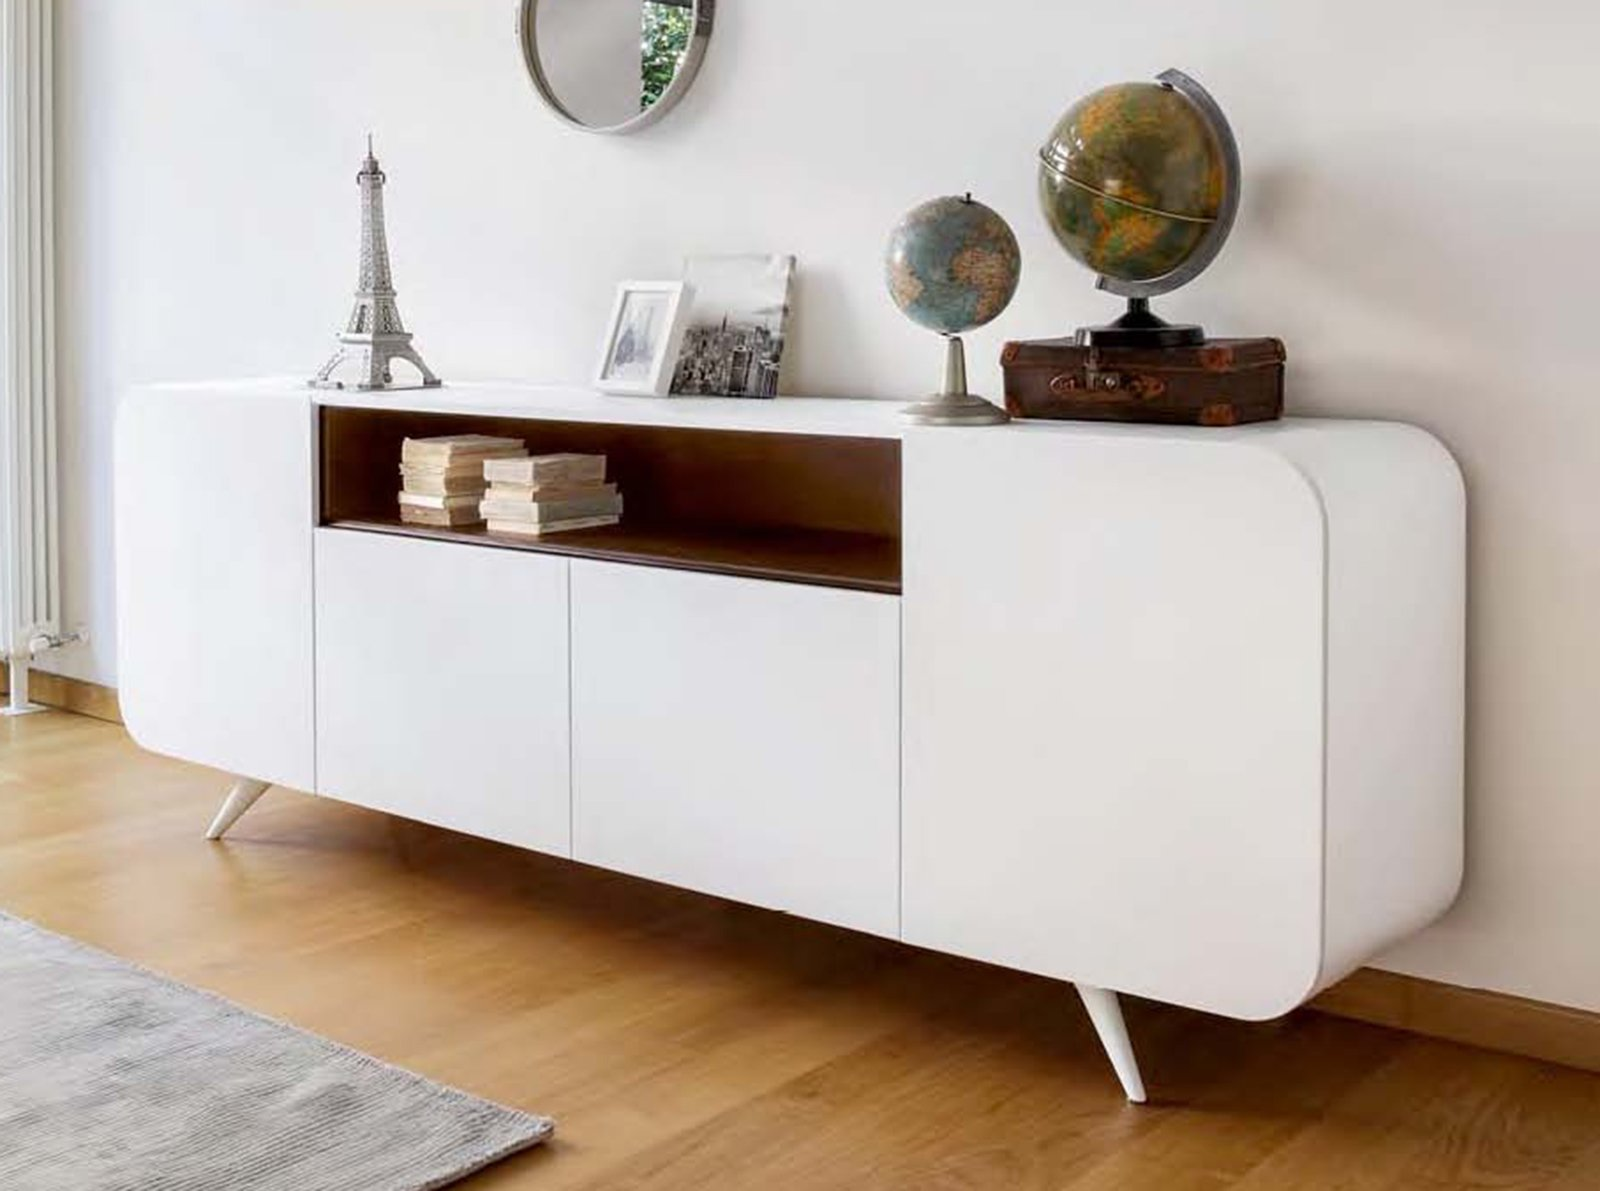 Credenza Sospesa Per Ingresso : Madie: mobili bassi per contenere cose di casa